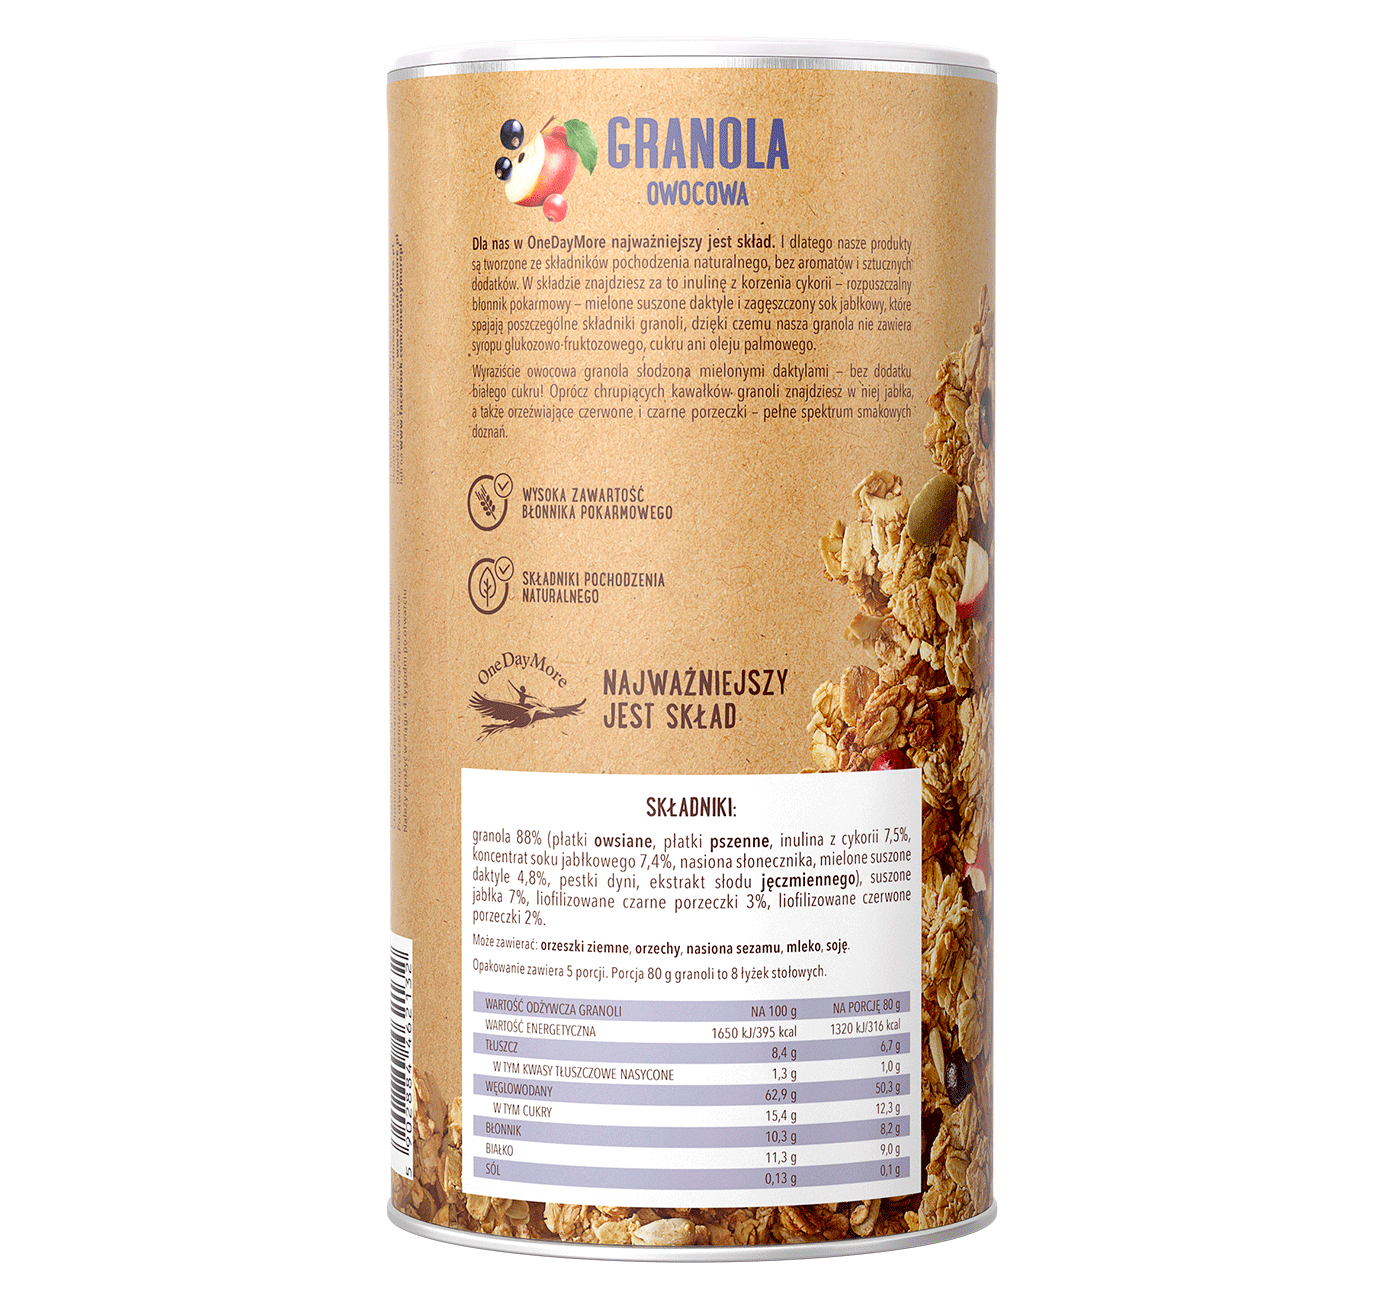 granola-owocowa-onedaymore-tuba-tyl-1400×1291